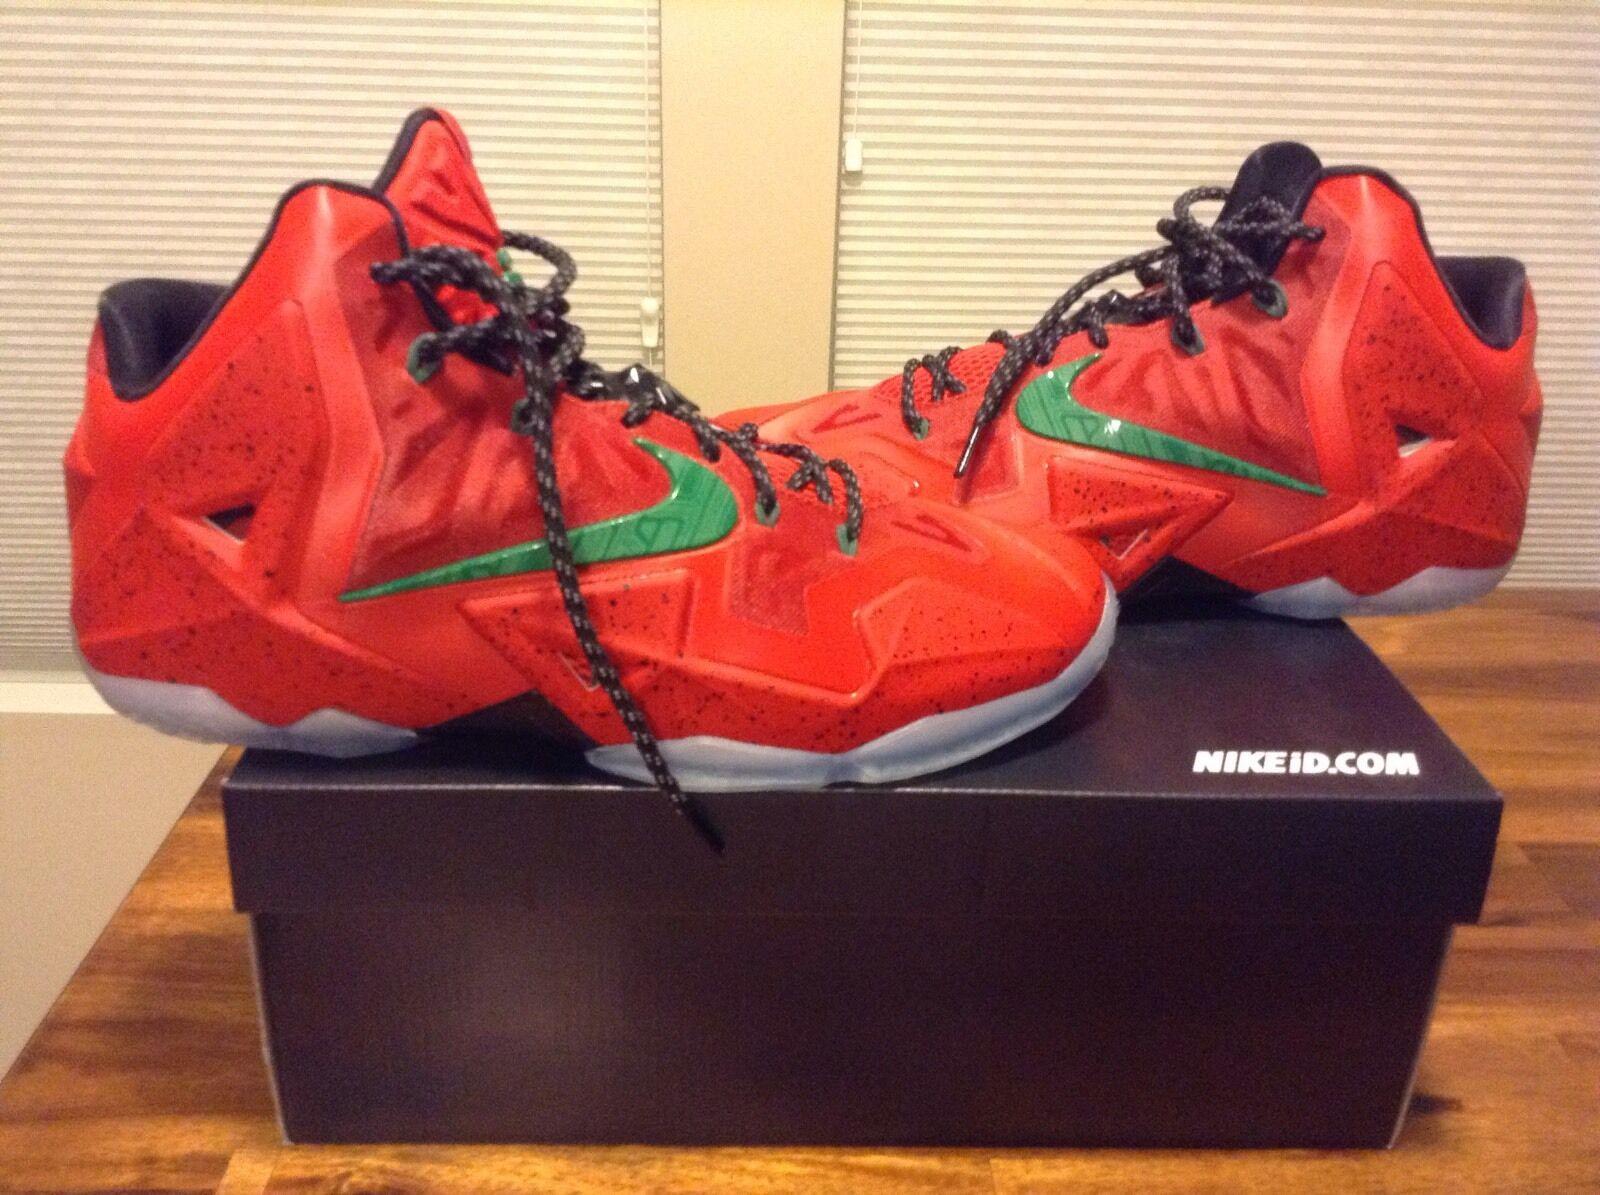 beb7cd6668ed Nike Lebron 11 11 11 NikeID Custom Shoes Sz 12 8105c8 - work.hilltop ...